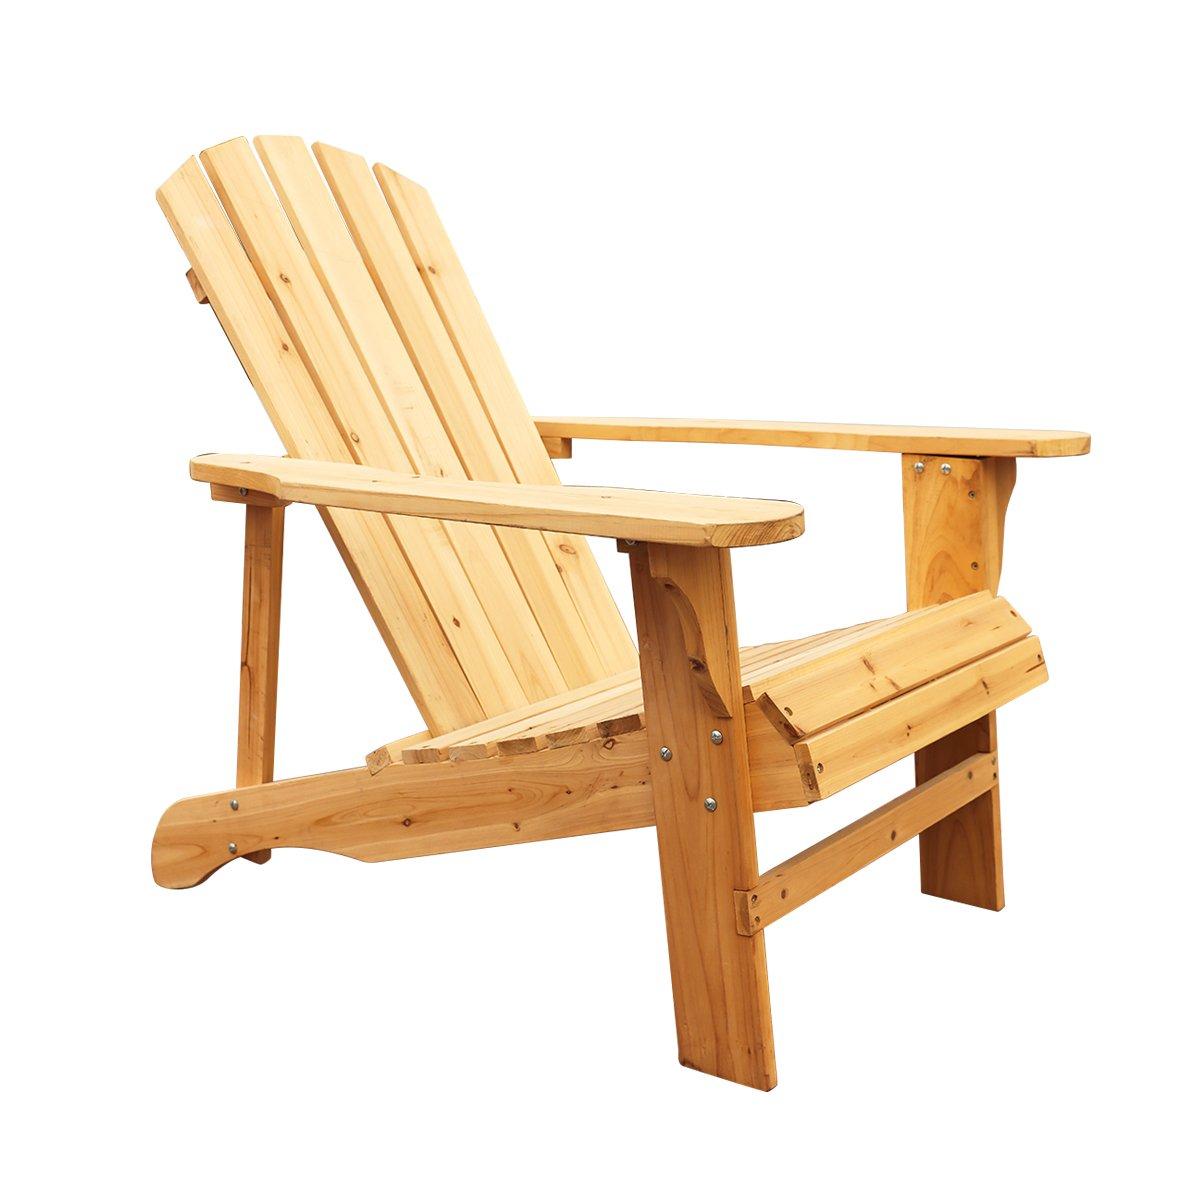 California Backyard Patio Furniture.Lokatse Home Wood Single Adirondack Chair Natural